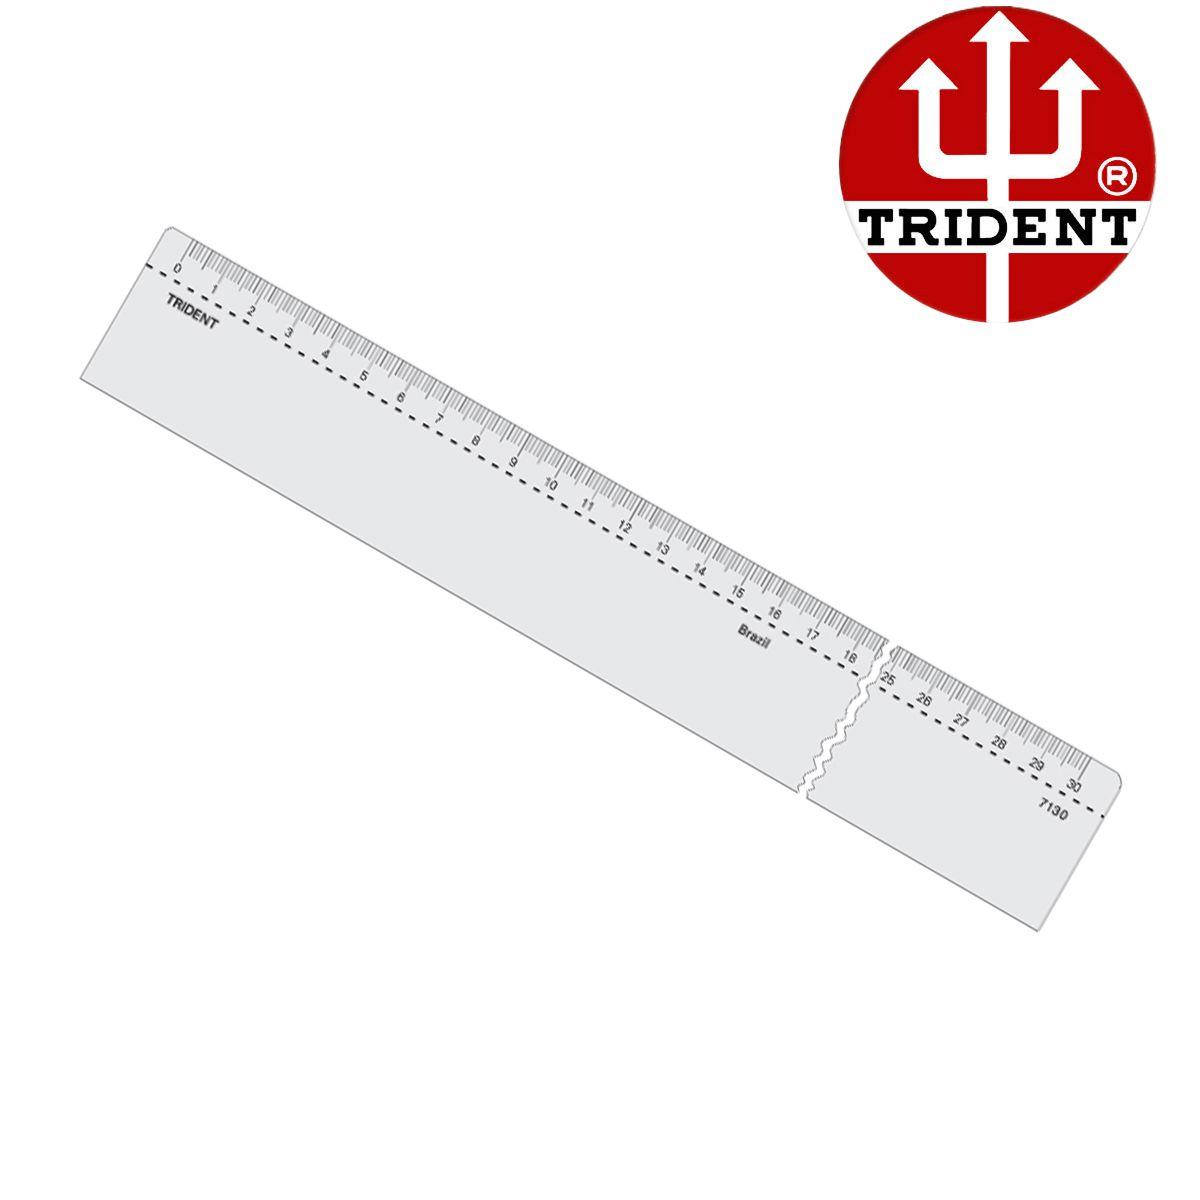 Régua de Acrílico Trident 40cm  Ref.7140